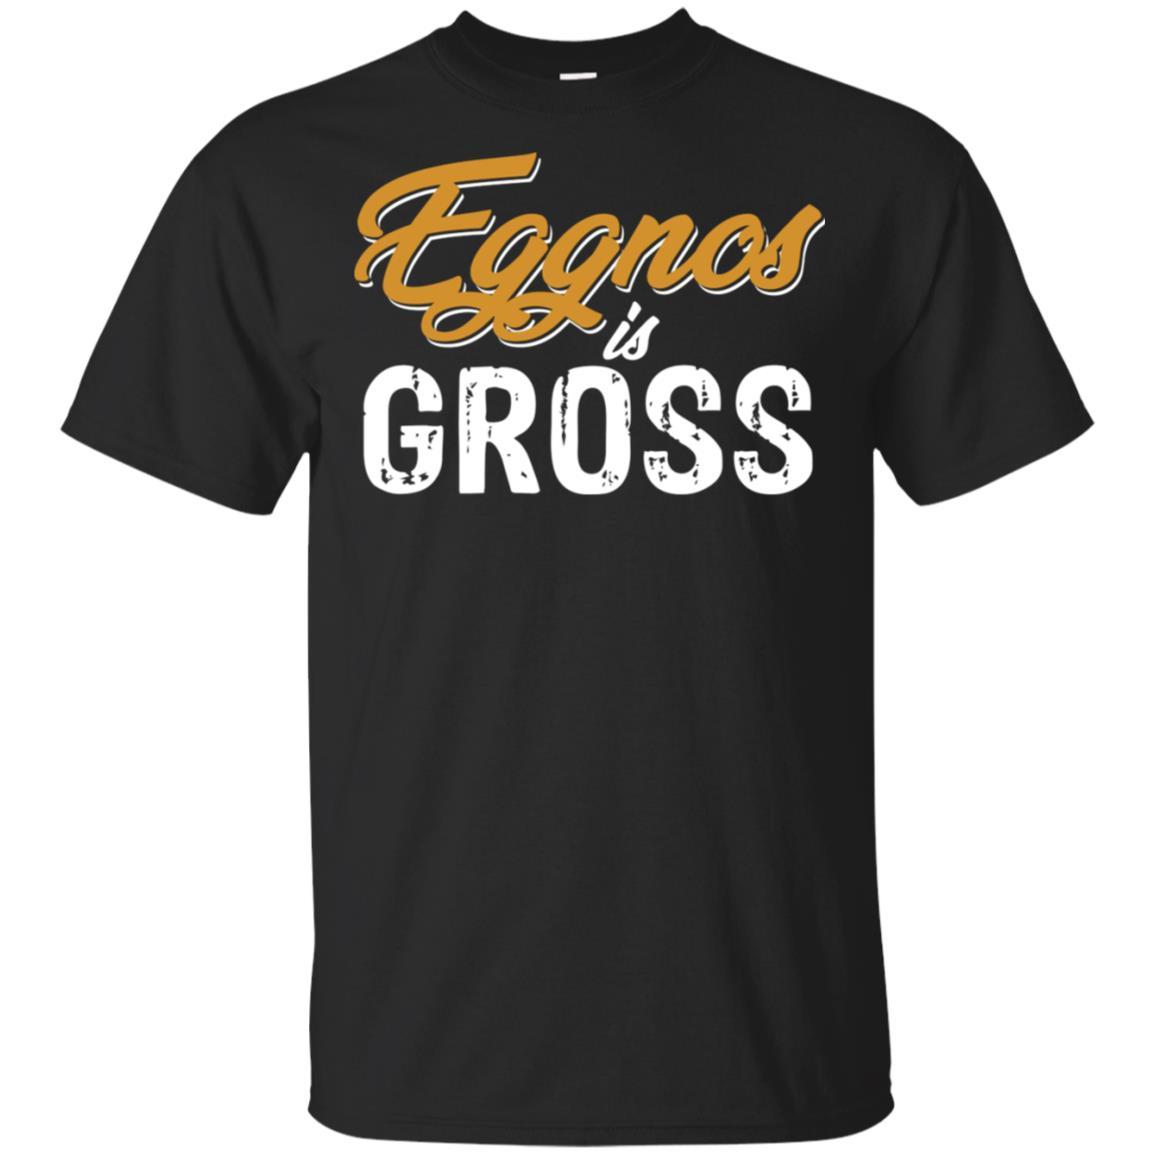 Christmas Eggnog is Gross Funny Tees Gift Xmas 2018 Unisex Short Sleeve